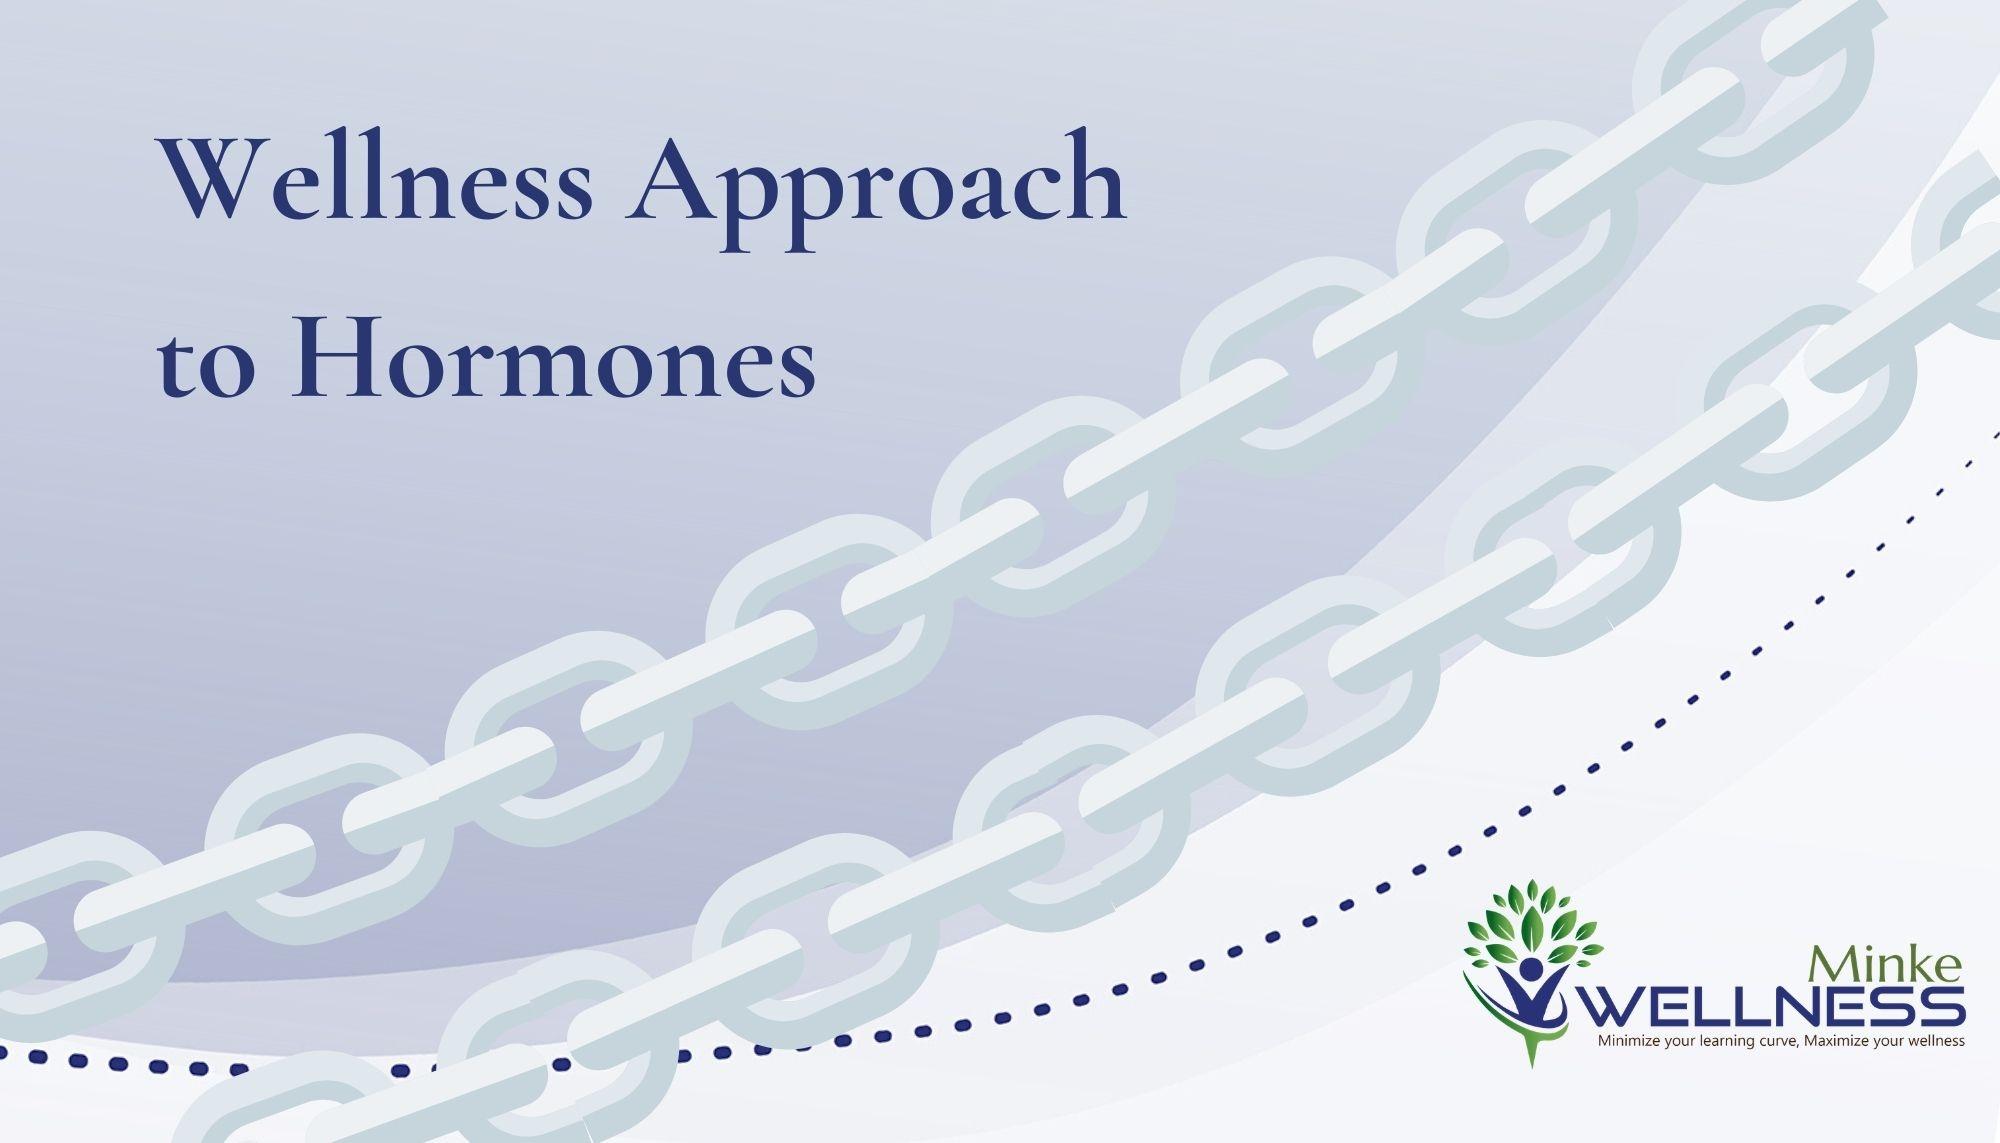 Wellness Approach to Hormones